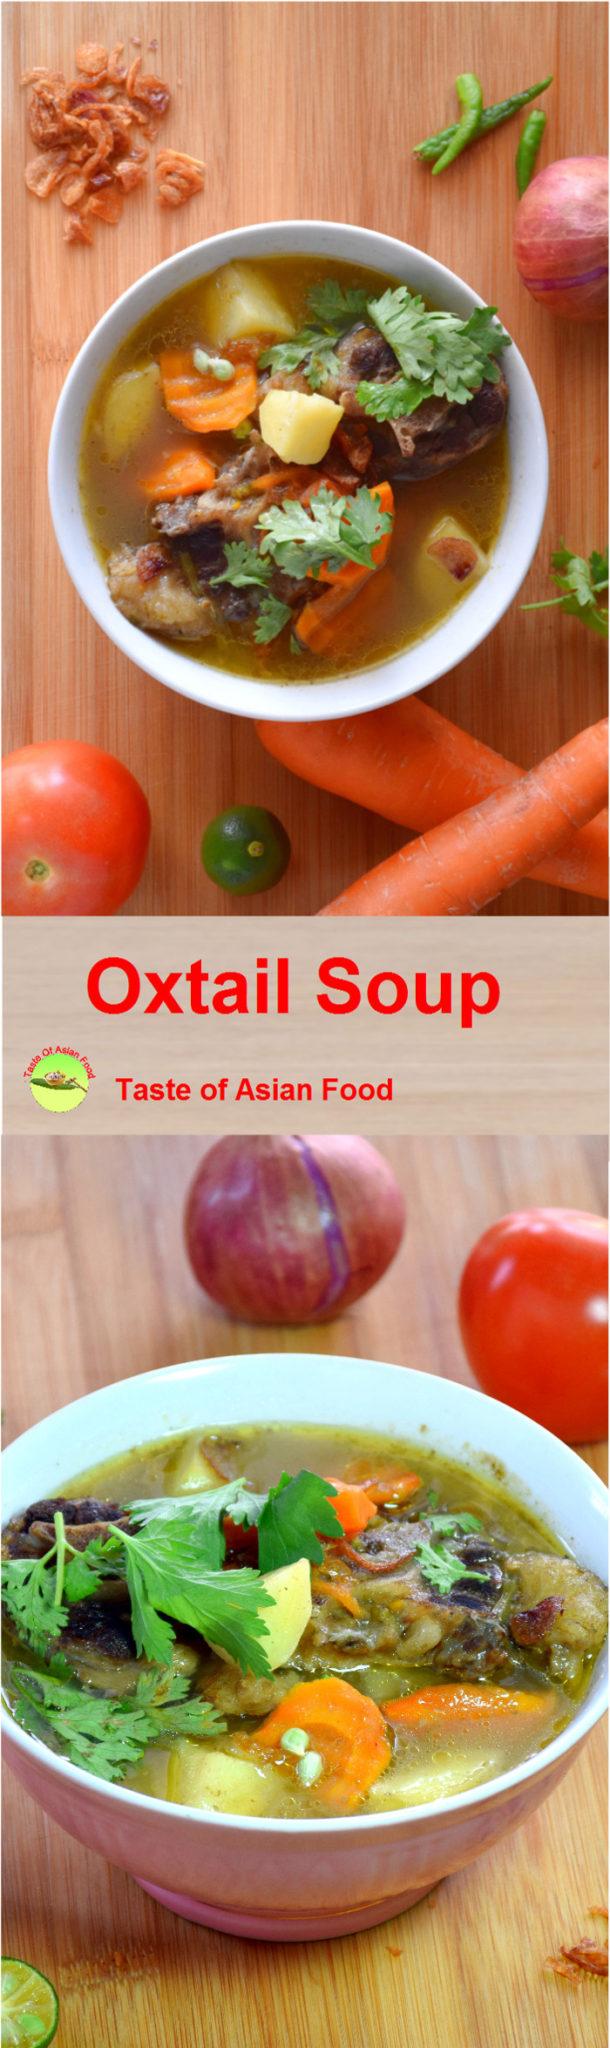 Malaysian oxtail soup recipe pin